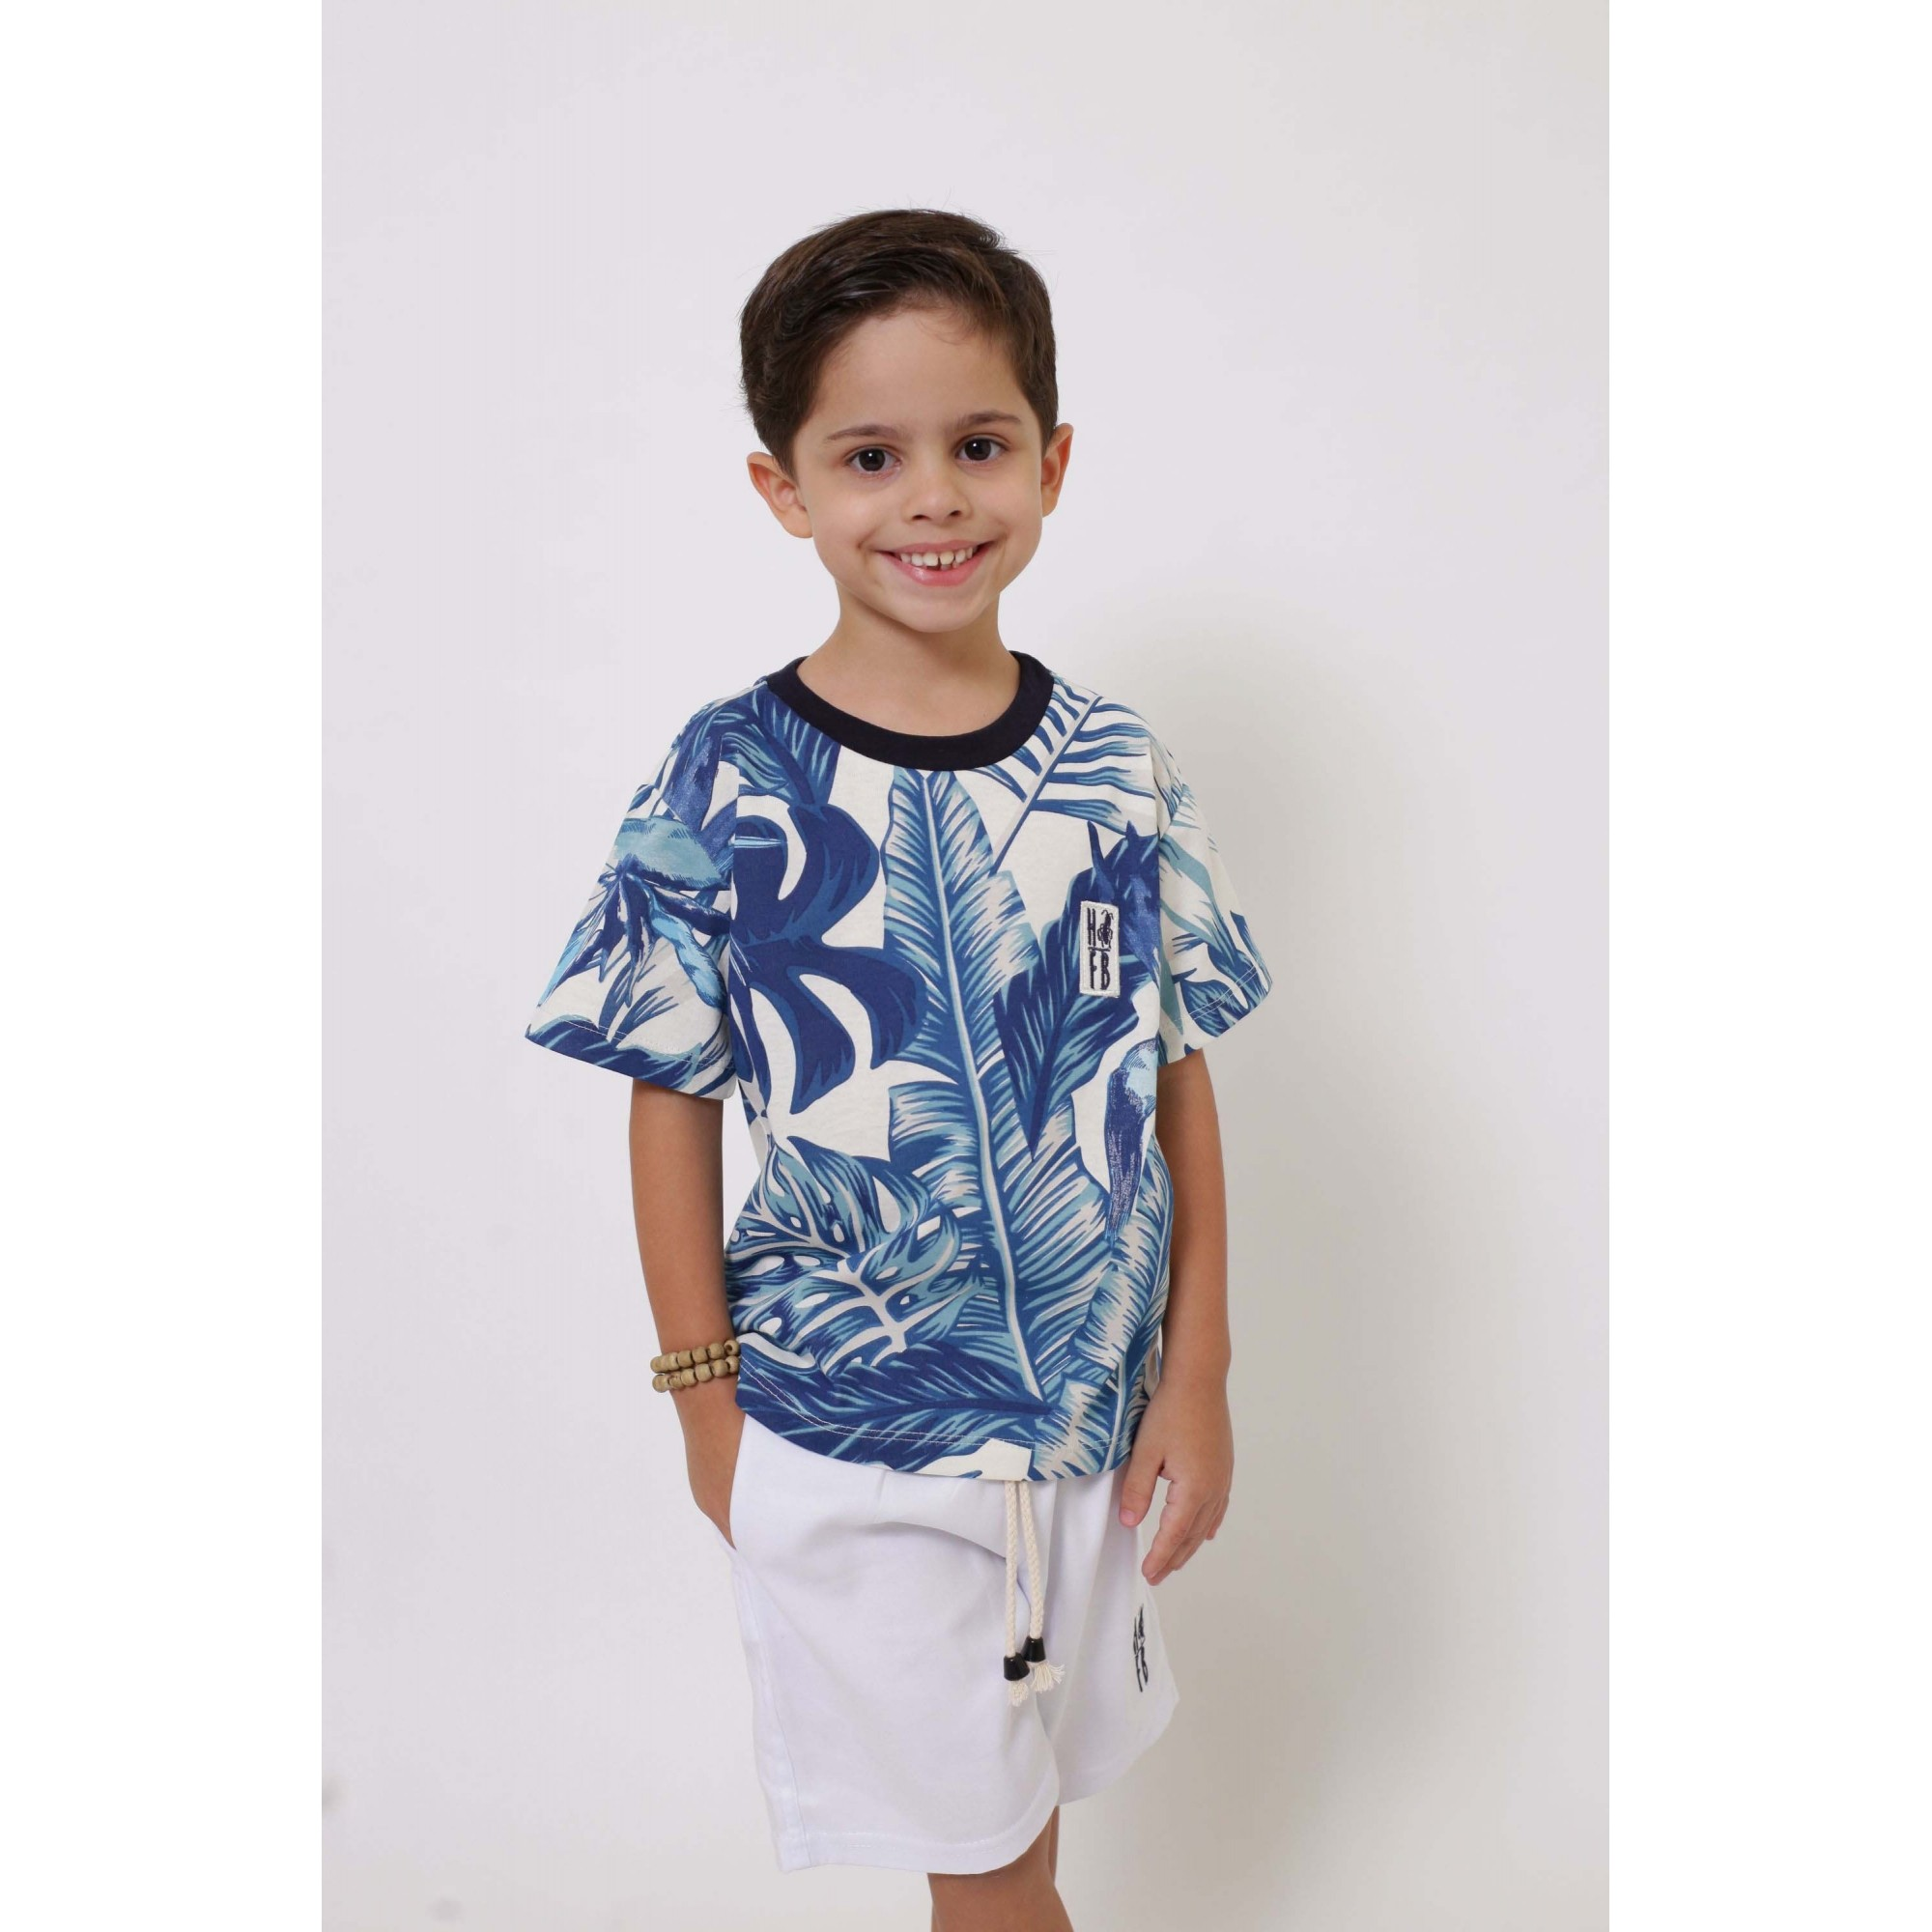 Camiseta ou Body Infantil Unissex - Caribe  - Heitor Fashion Brazil